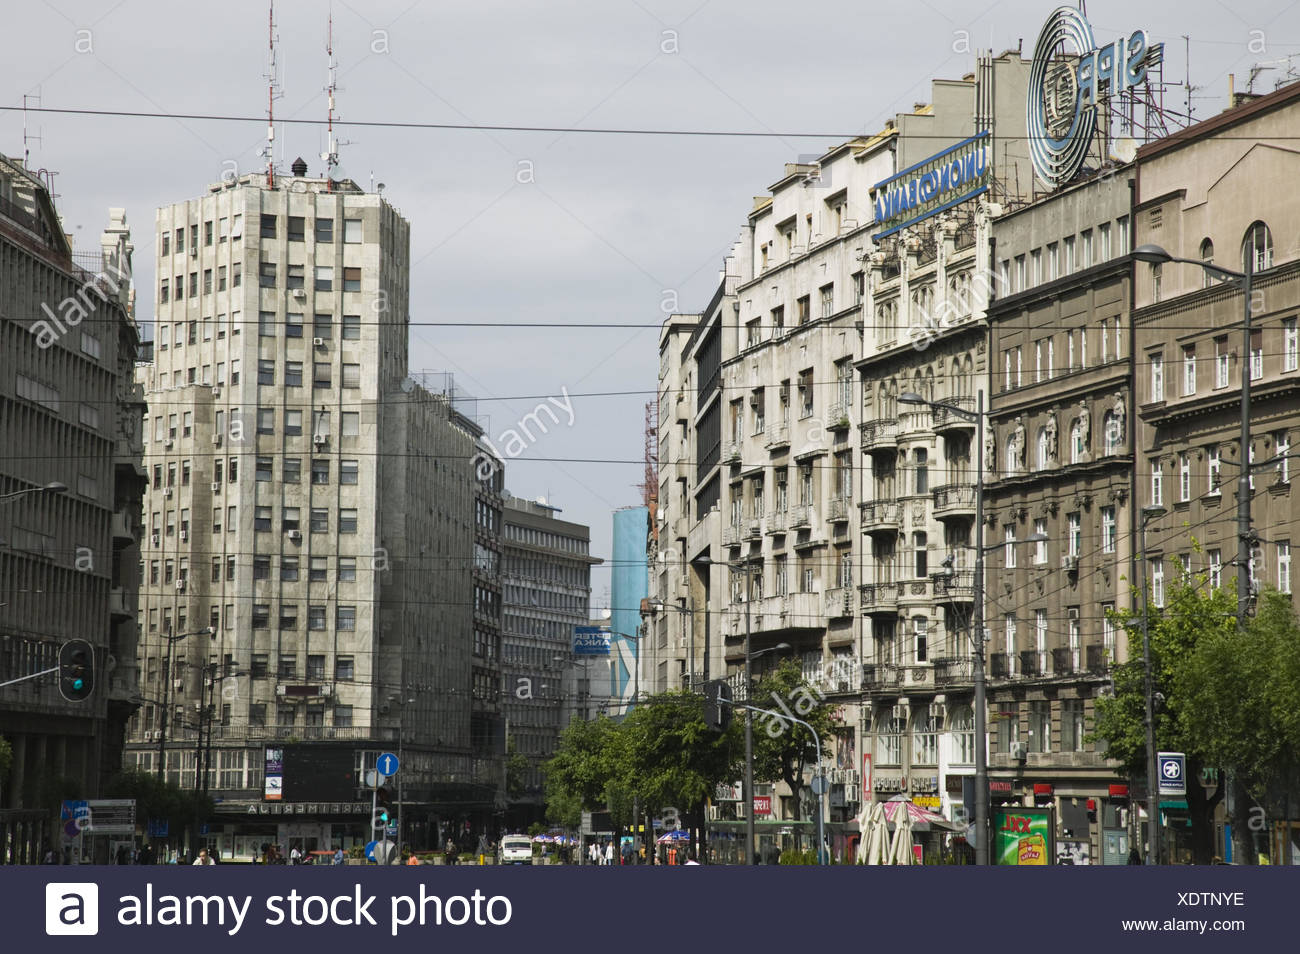 Serbien, Belgrad, Terazije, Albanien Hochhaus, - Stock Image